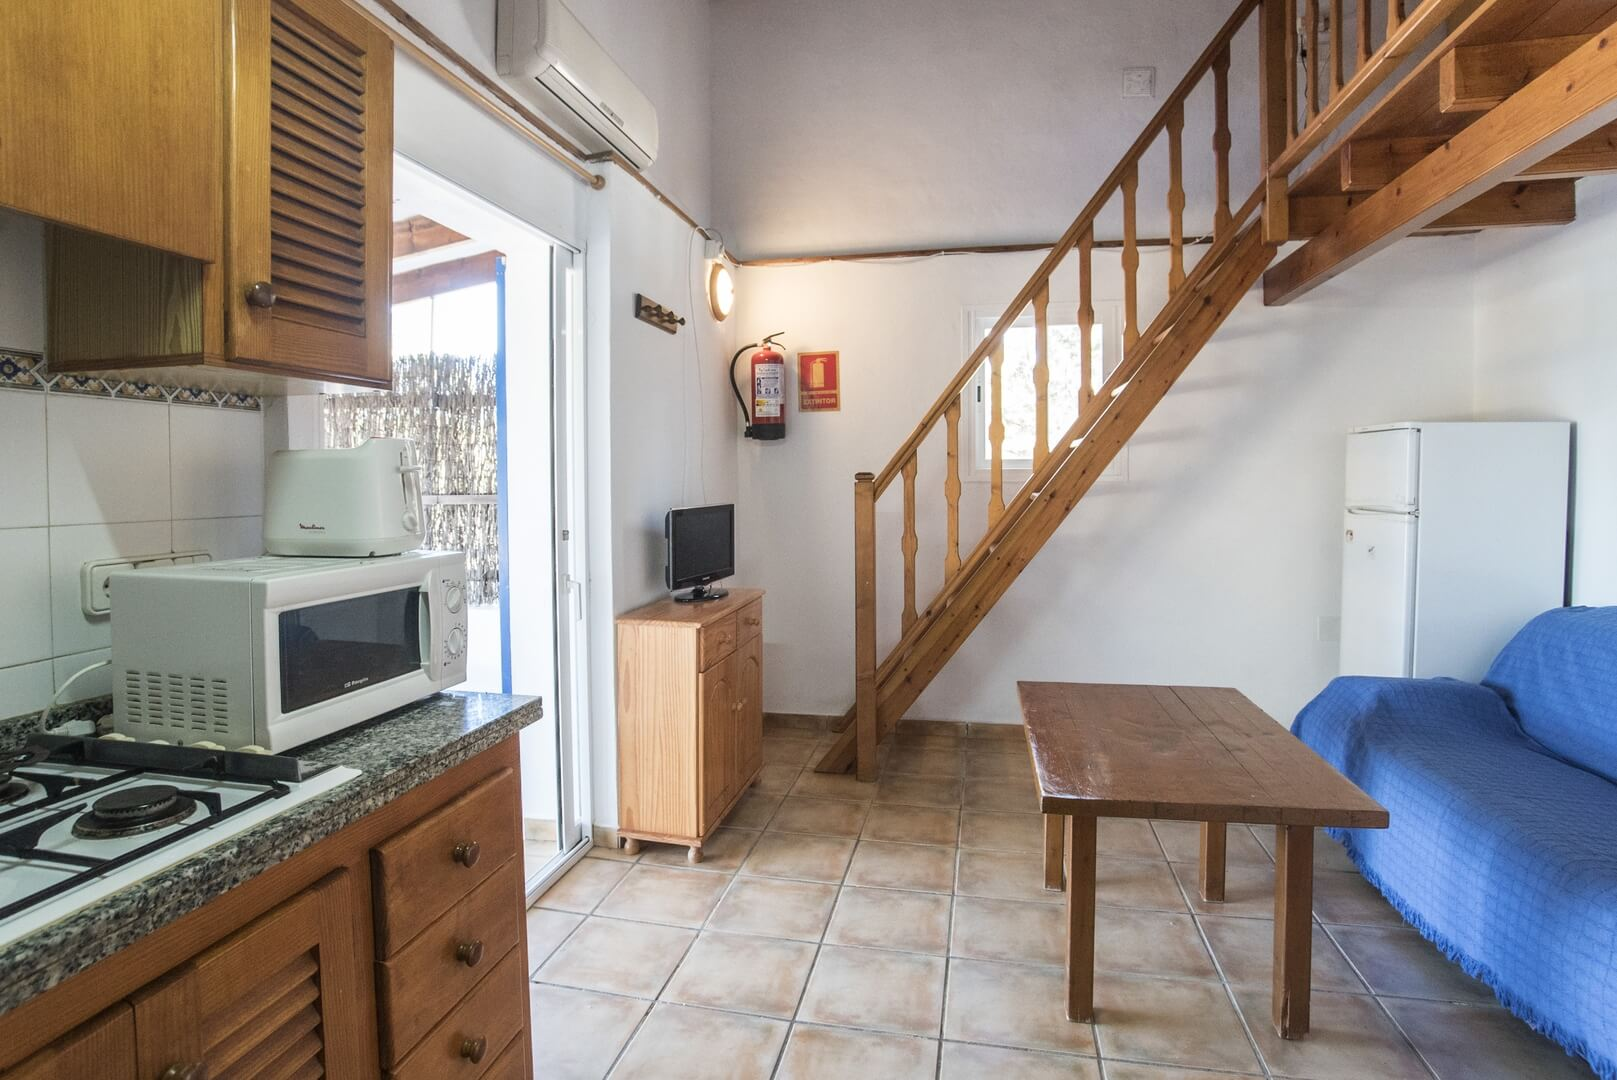 Casa Alquiler Formentera. Casa Patricia 4. Cala Saona